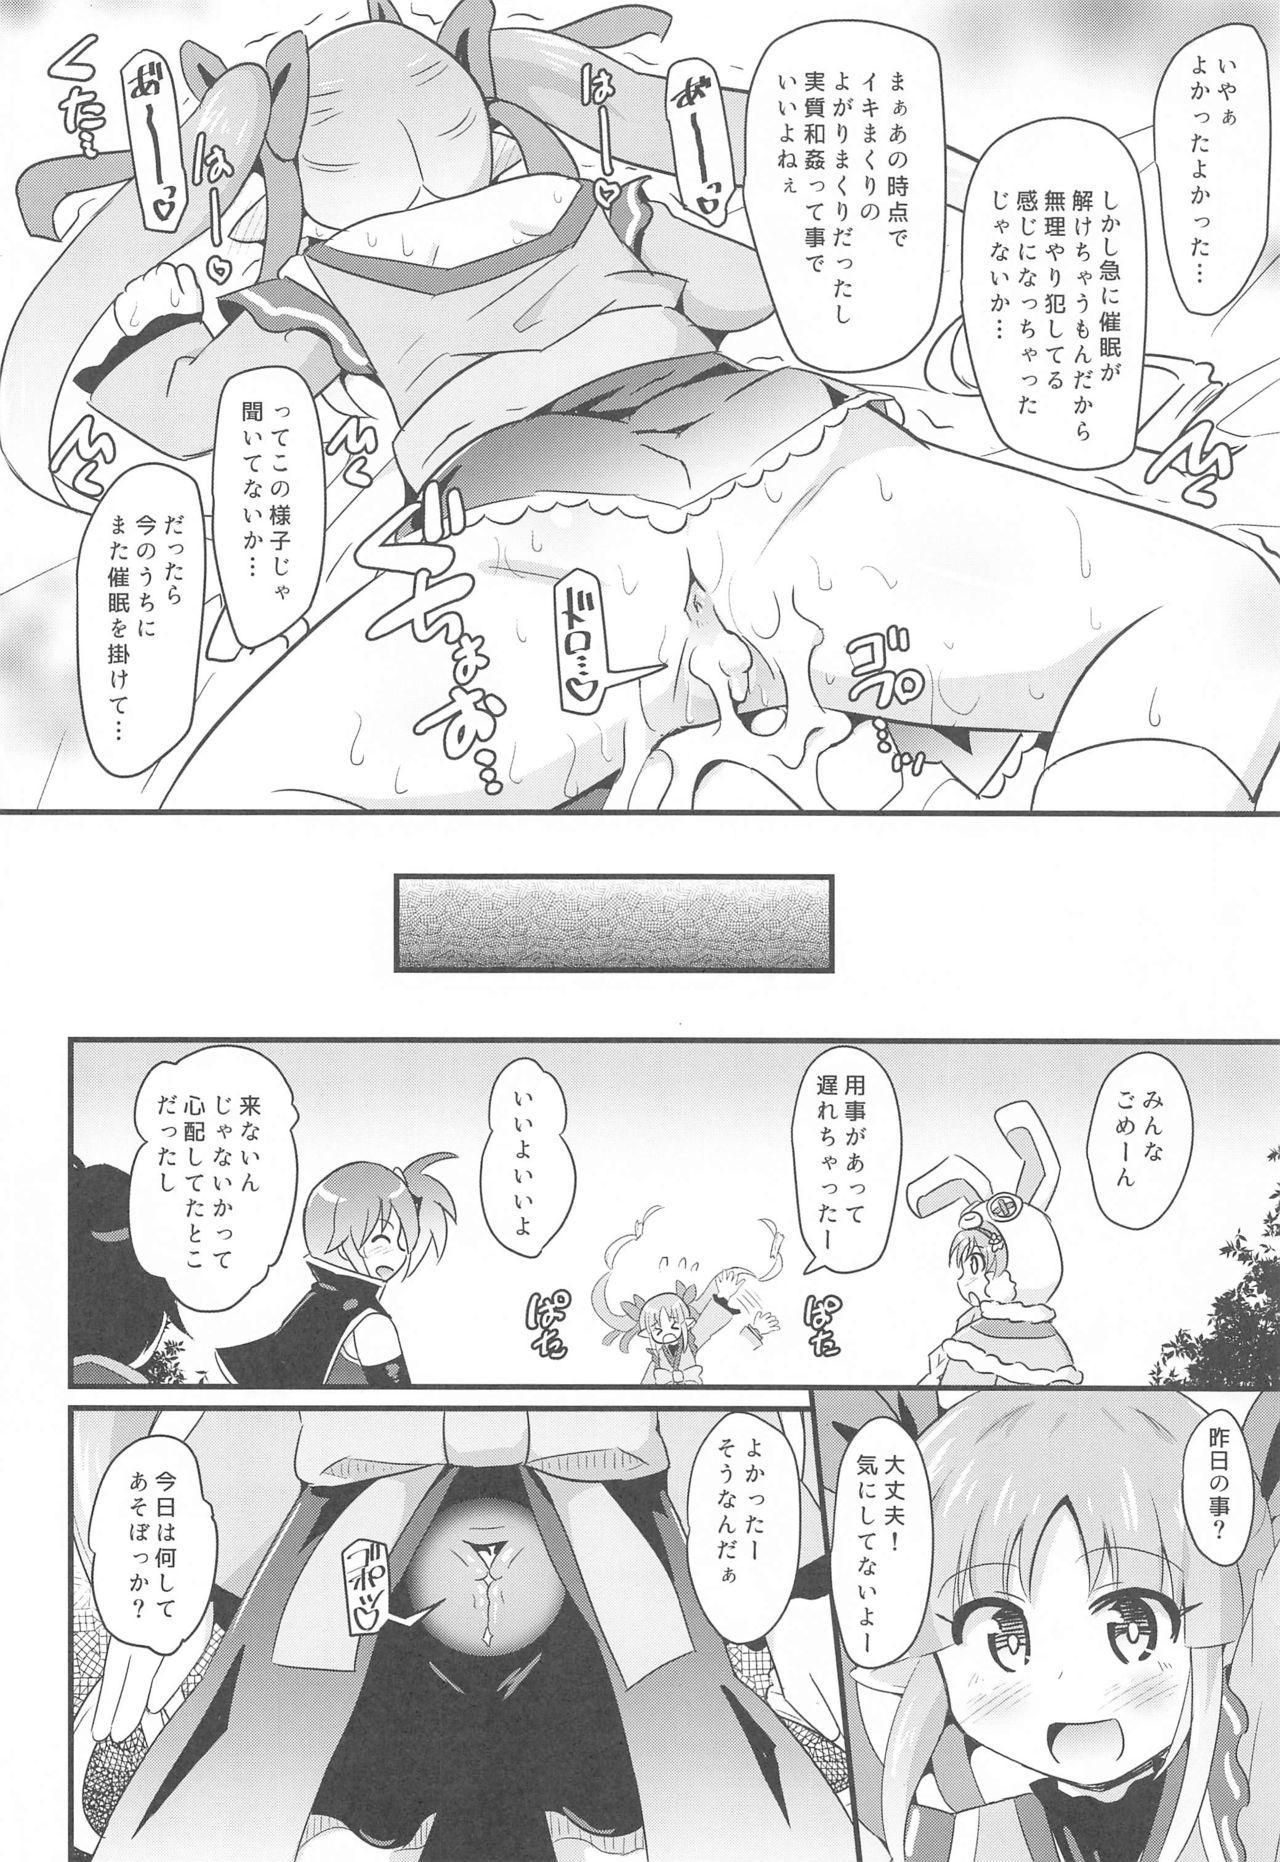 Kyouka-chan to Saimin Hentai Ecchi!! 22